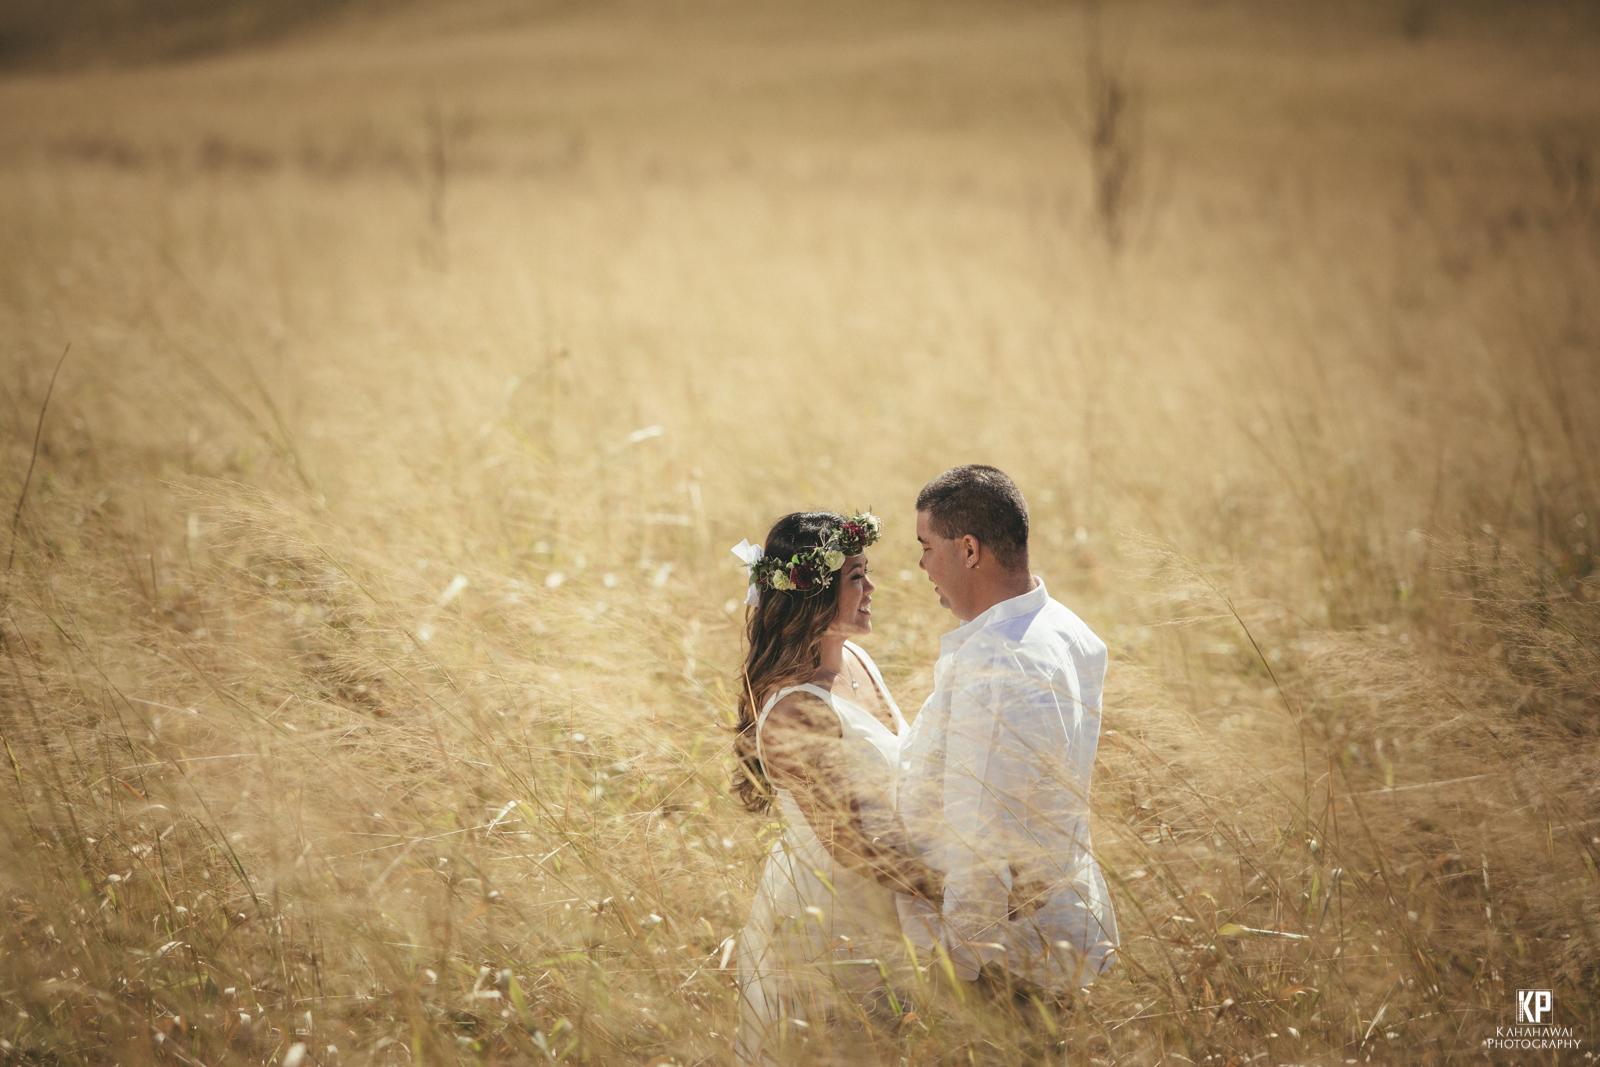 Kauai wedding photographer Kahahawai Photography shooting engagement portraits on the slopes of Waimea Canyon